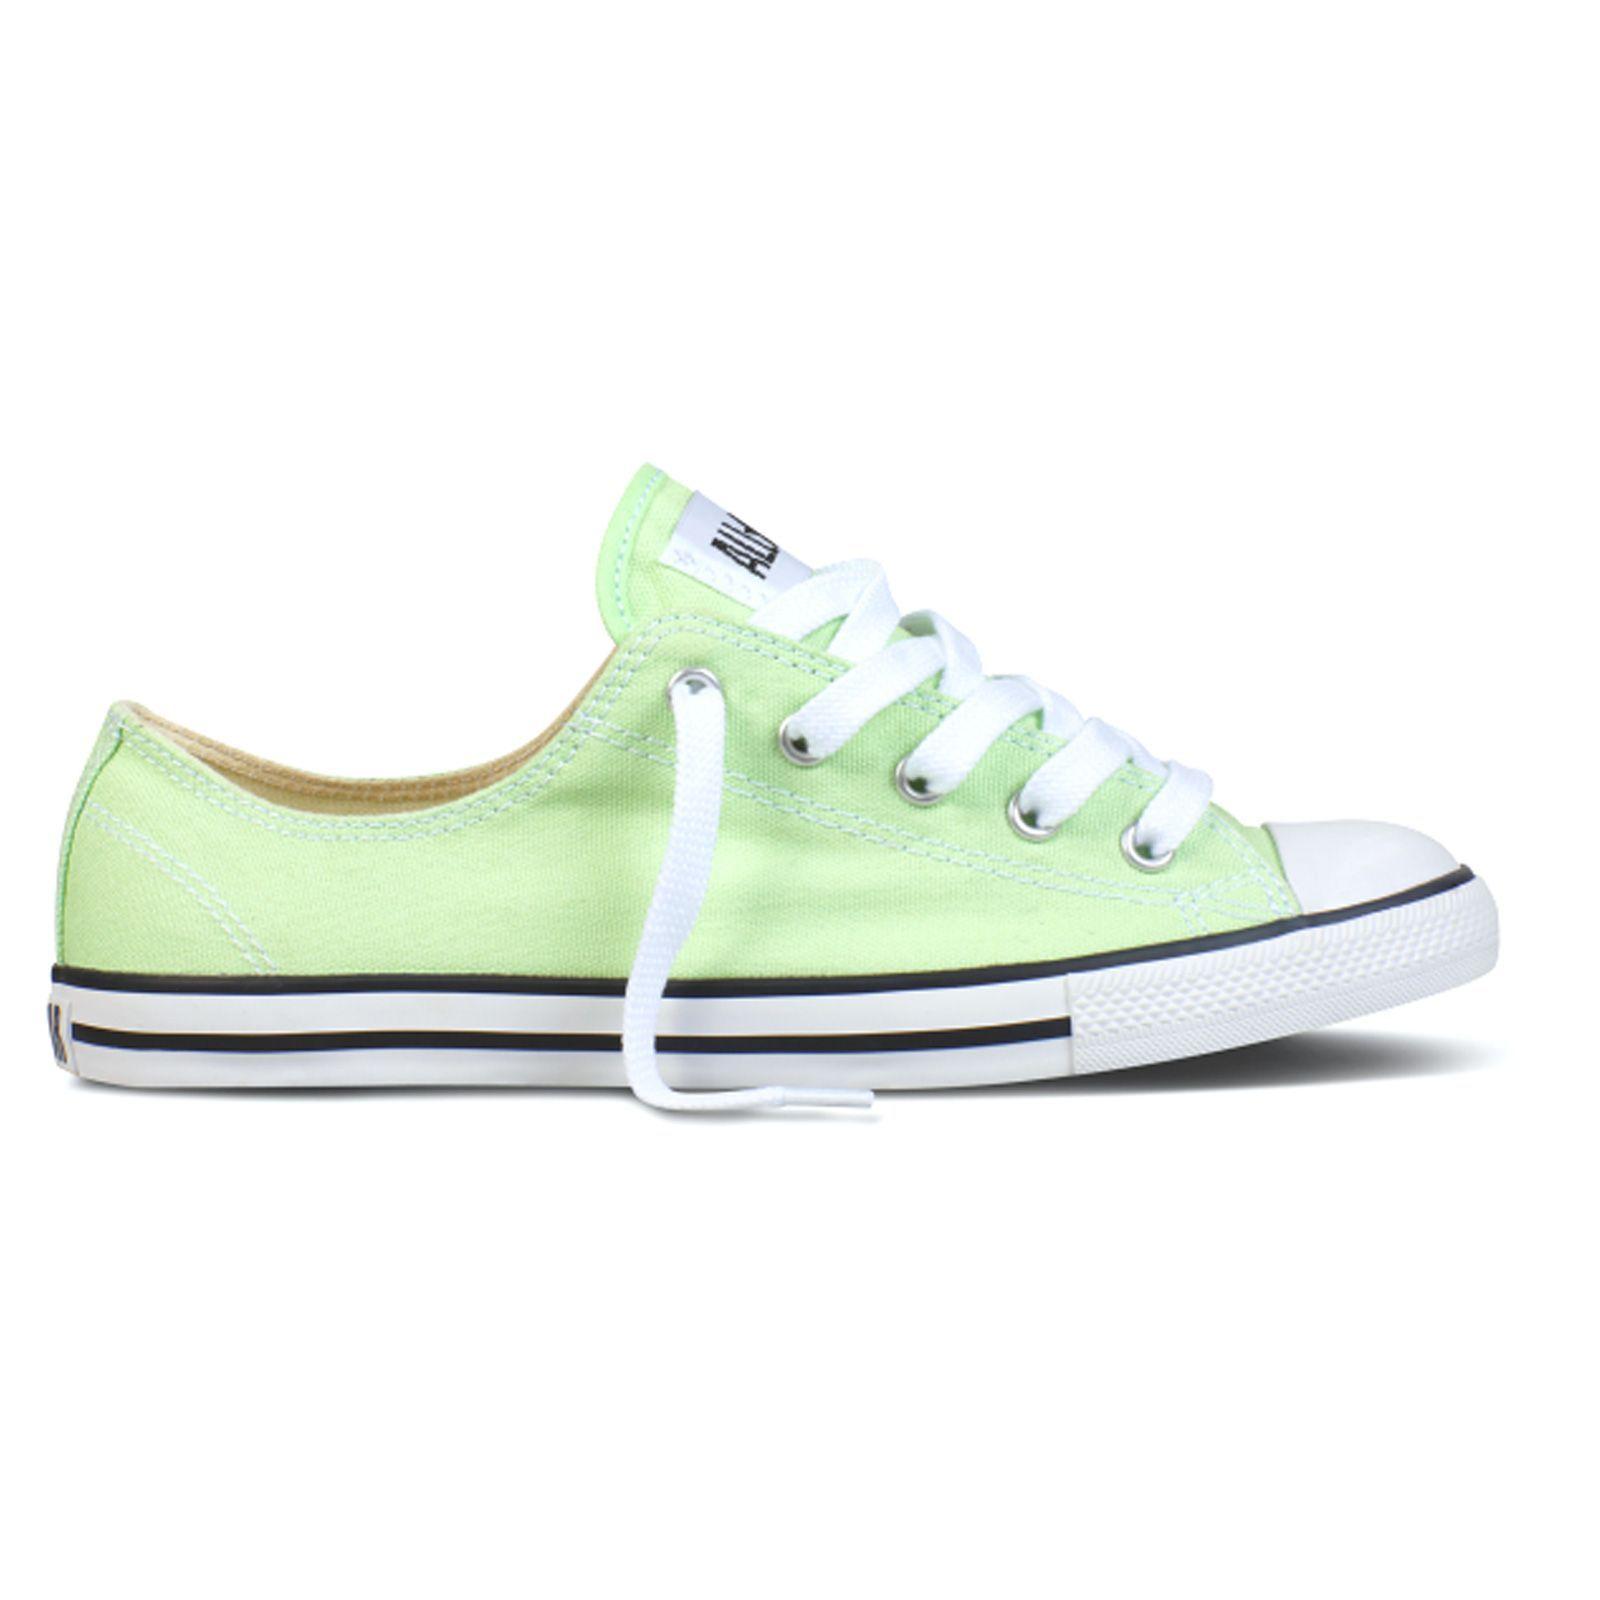 Sneakers As Dainty vert clair et blanc Converse